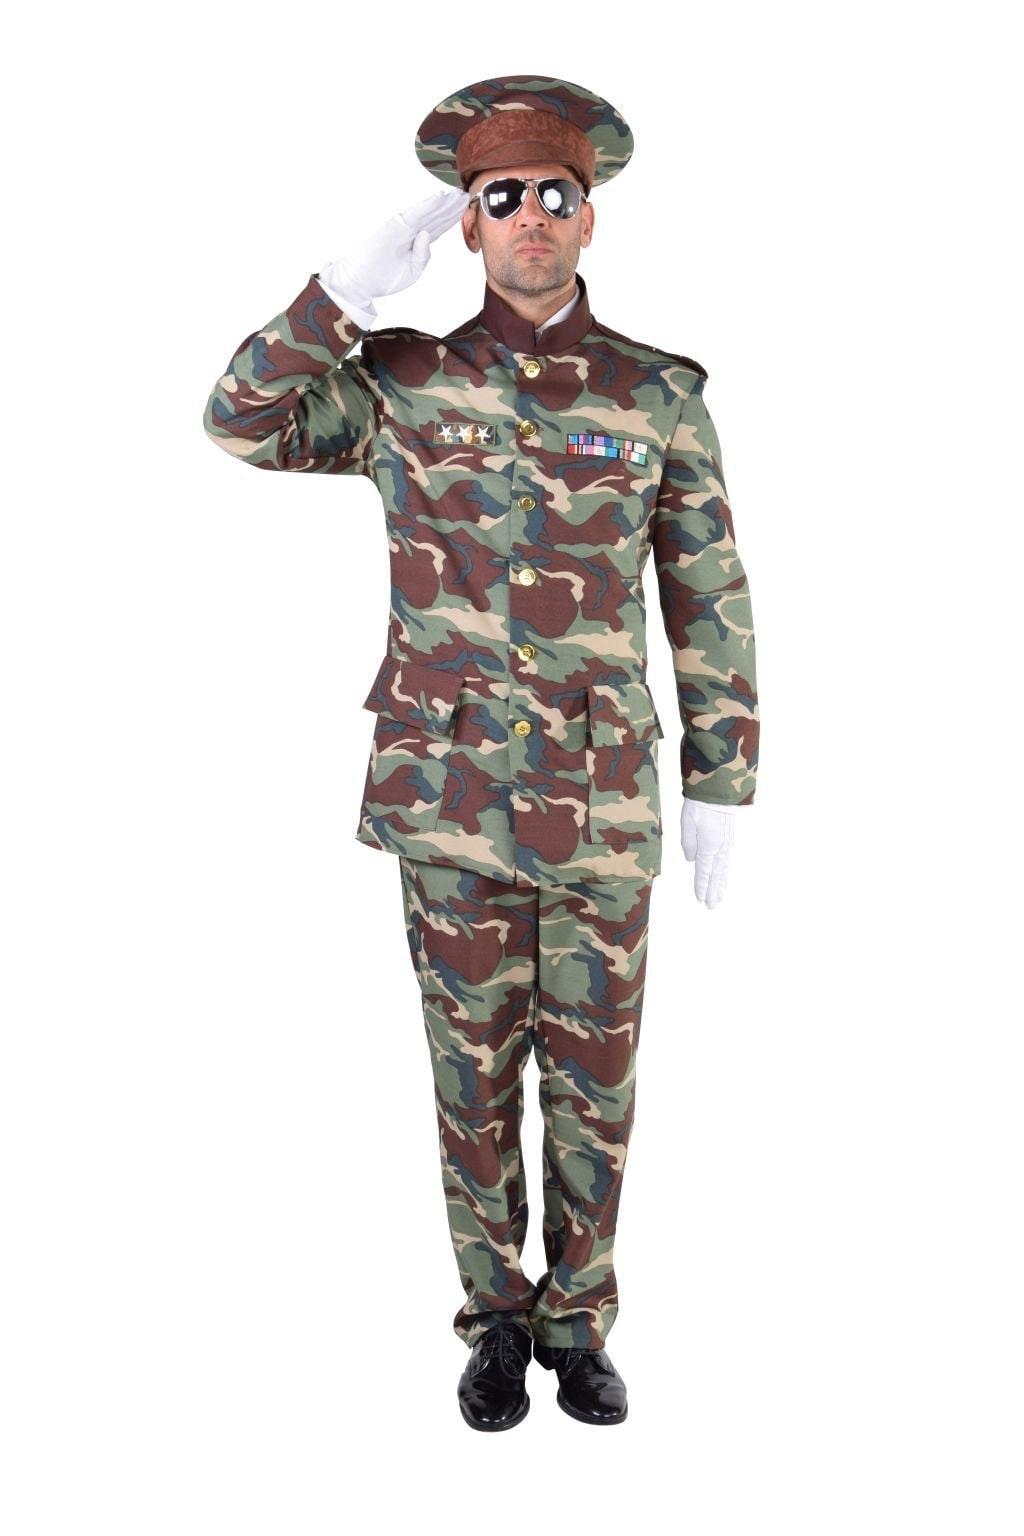 Officier camouflage